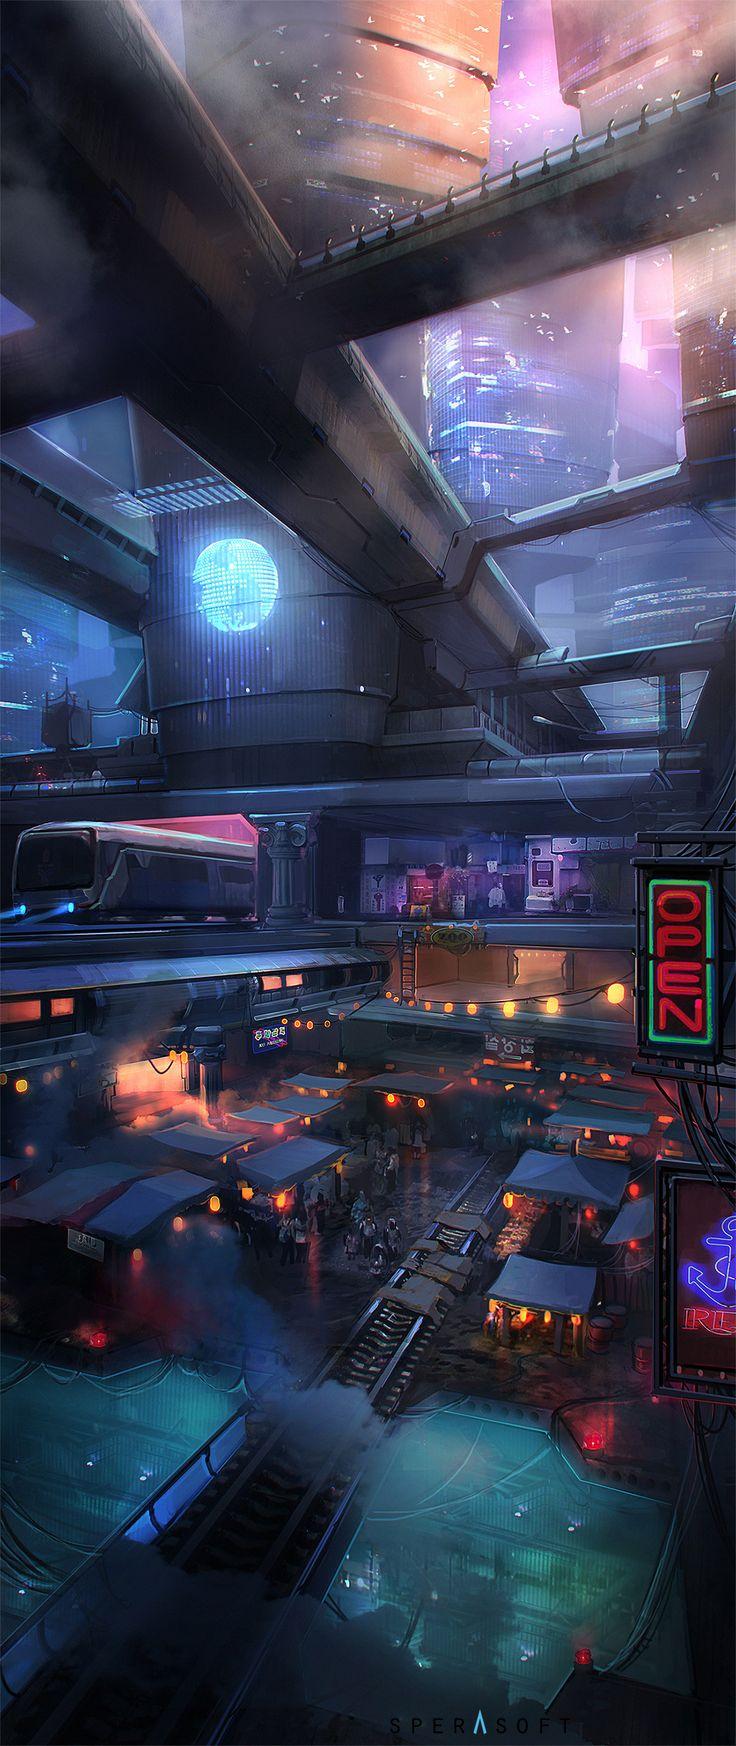 ArtStation - Cyberpunk environment, Sperasoft Studio